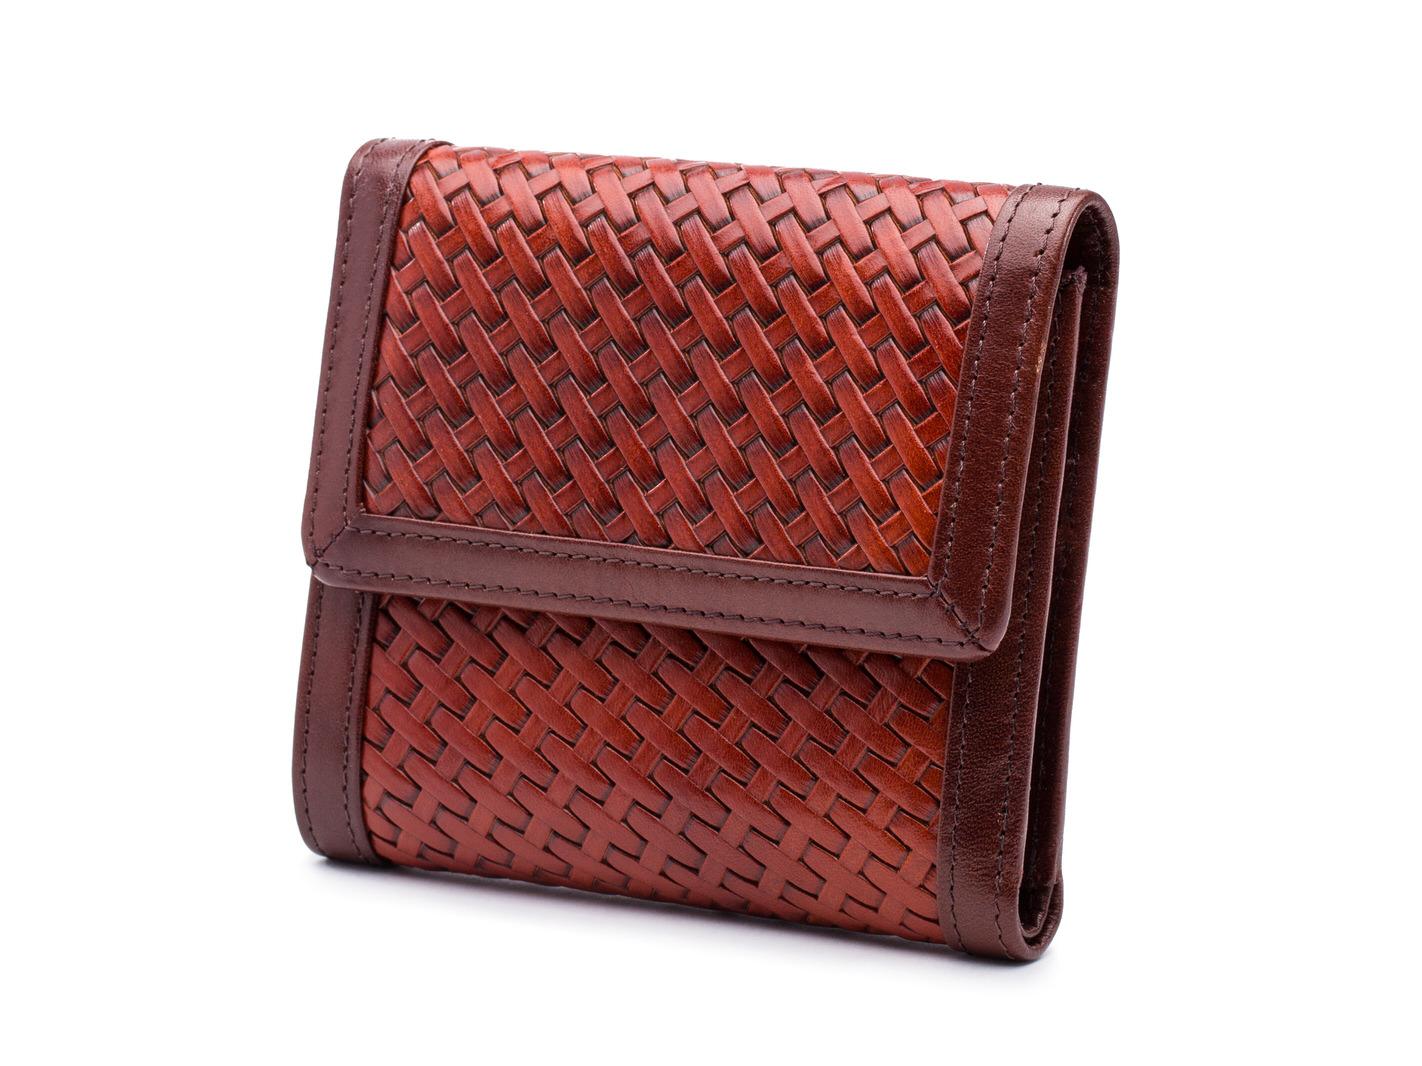 Basket Style Small Wallet-214 Dark Auburn - 214 Dark Auburn